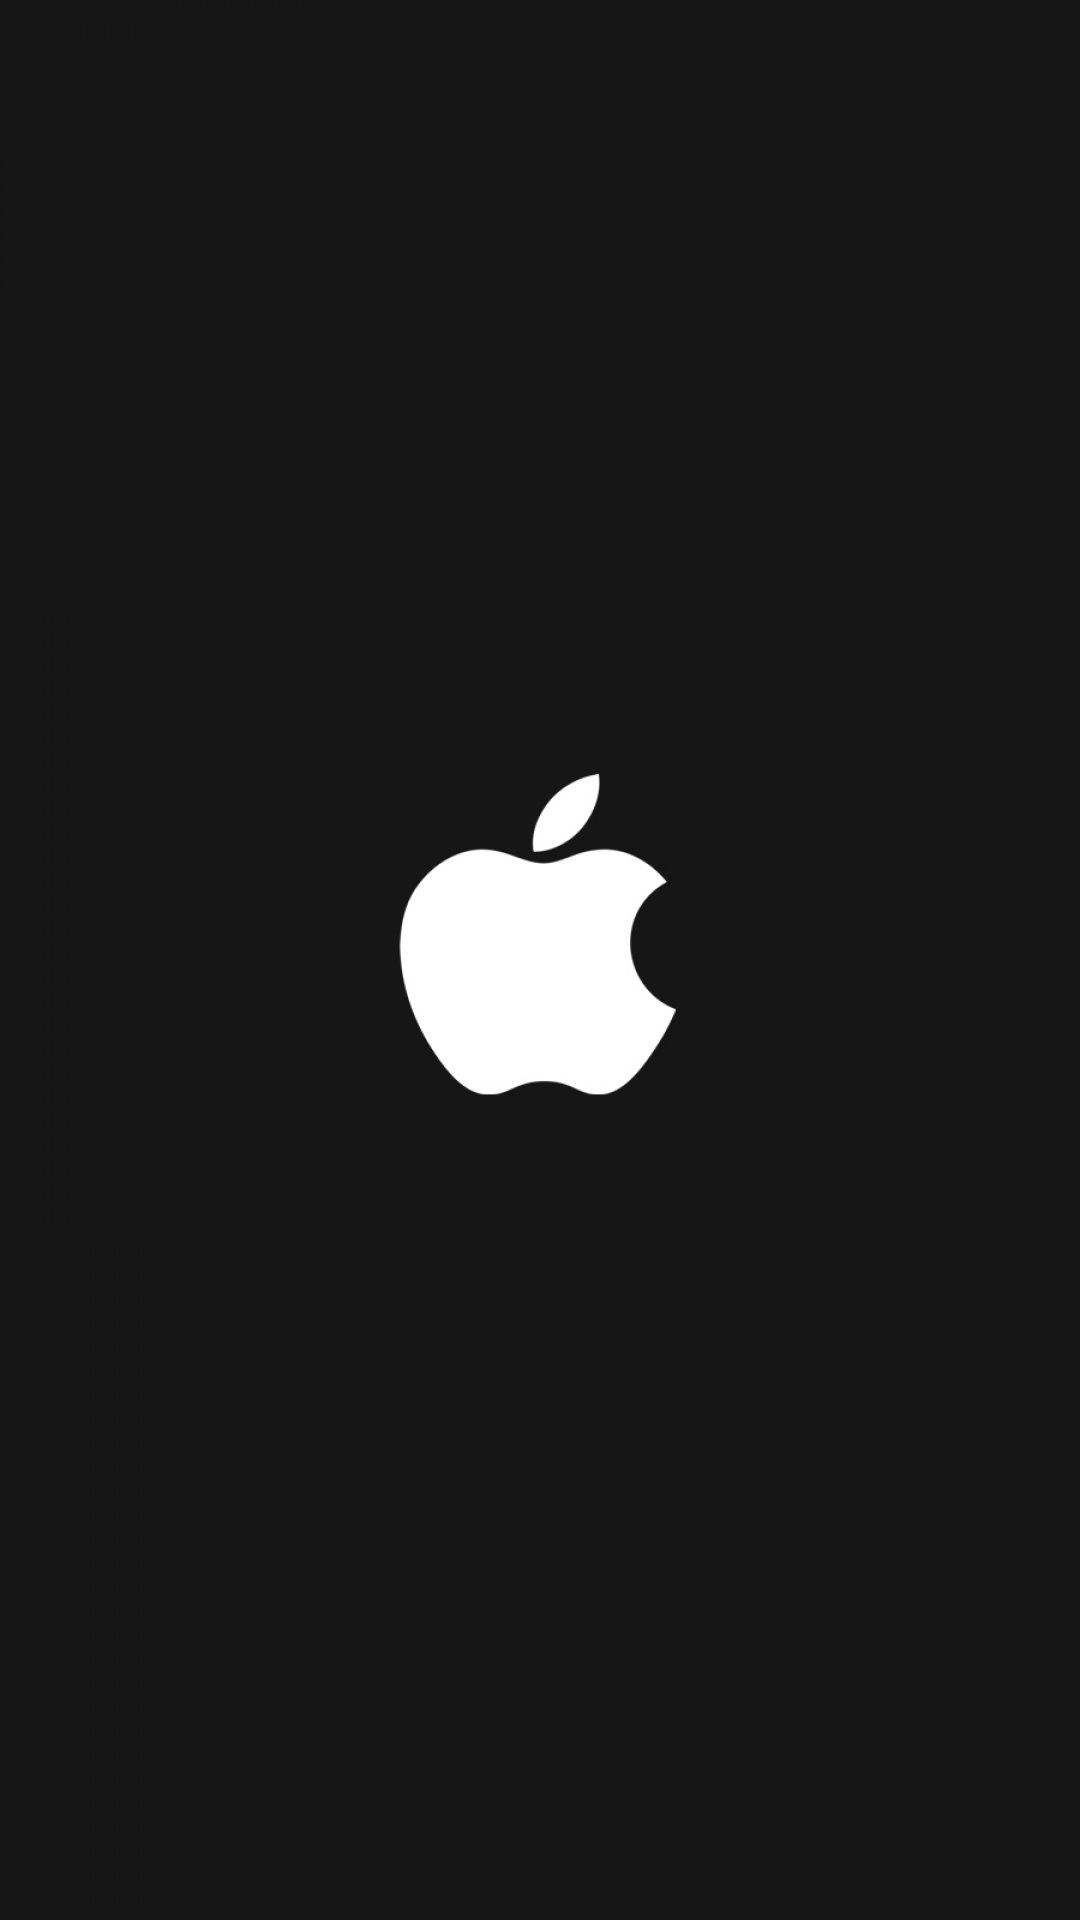 Apple Logo Wallpaper Iphone Apple Wallpaper Apple Wallpaper Iphone